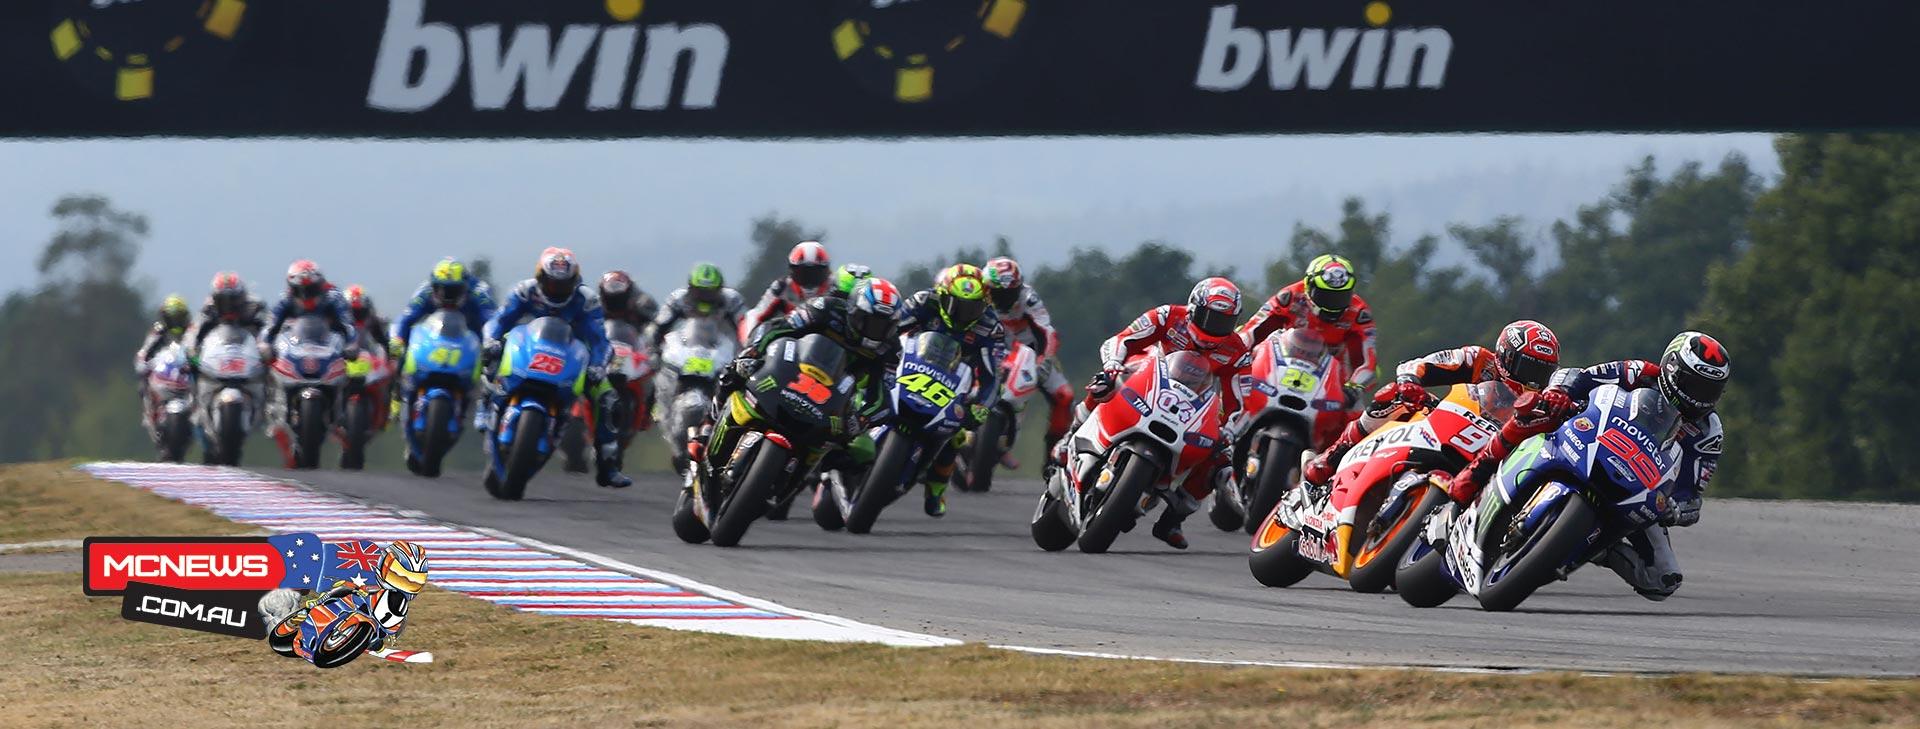 MotoGP 2015 - Round 11 - Brno